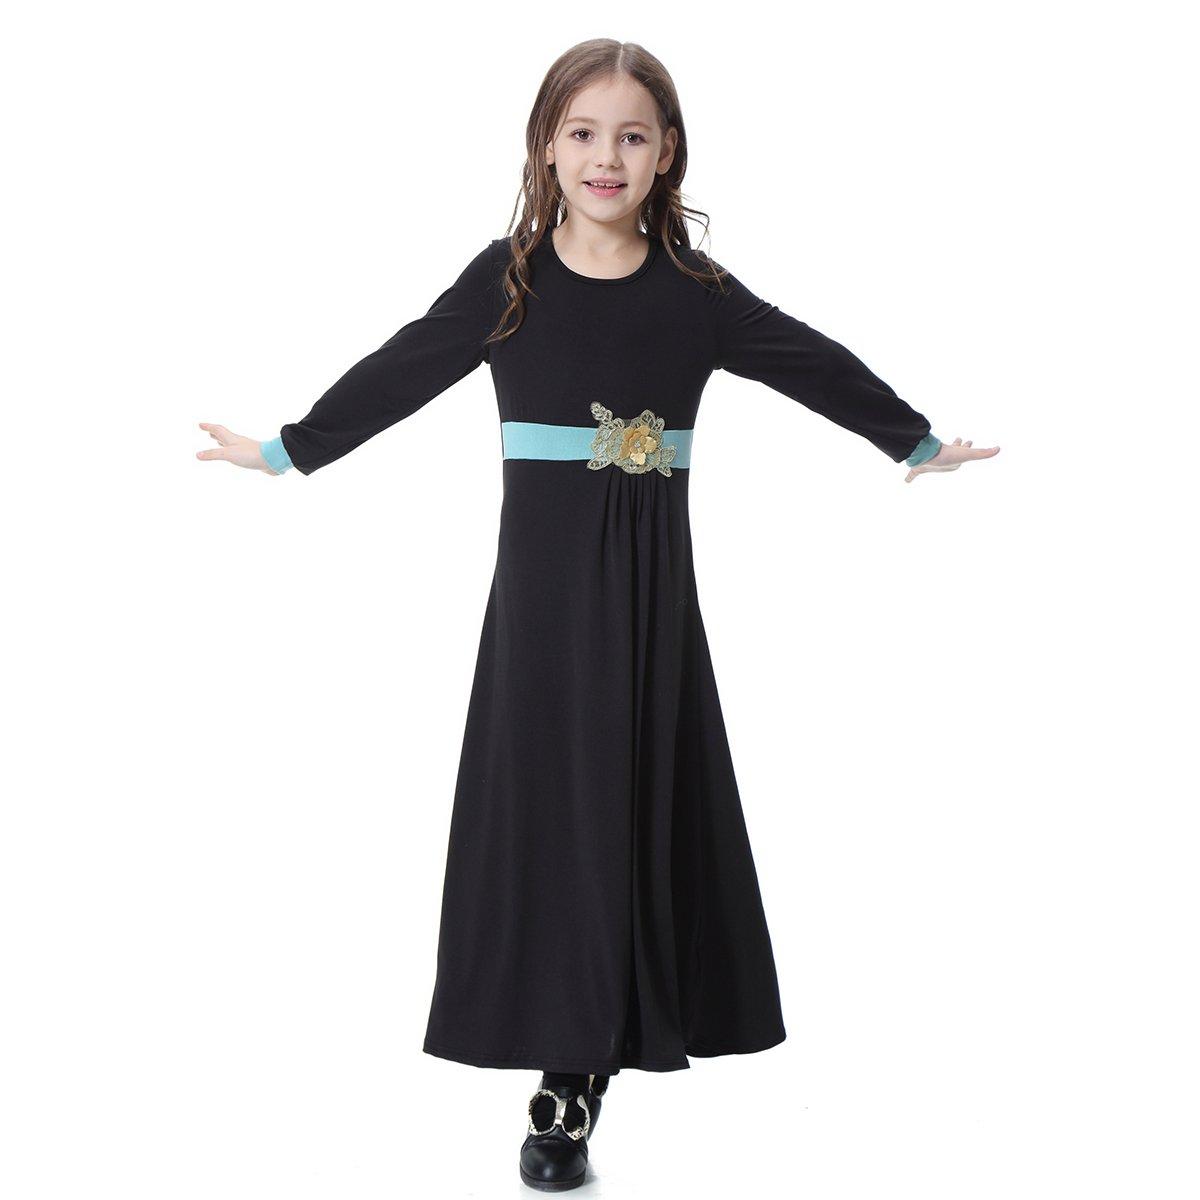 BMSGM Medio Oriente Arabia Lslamic Chica étnica Otoño e Invierno ...